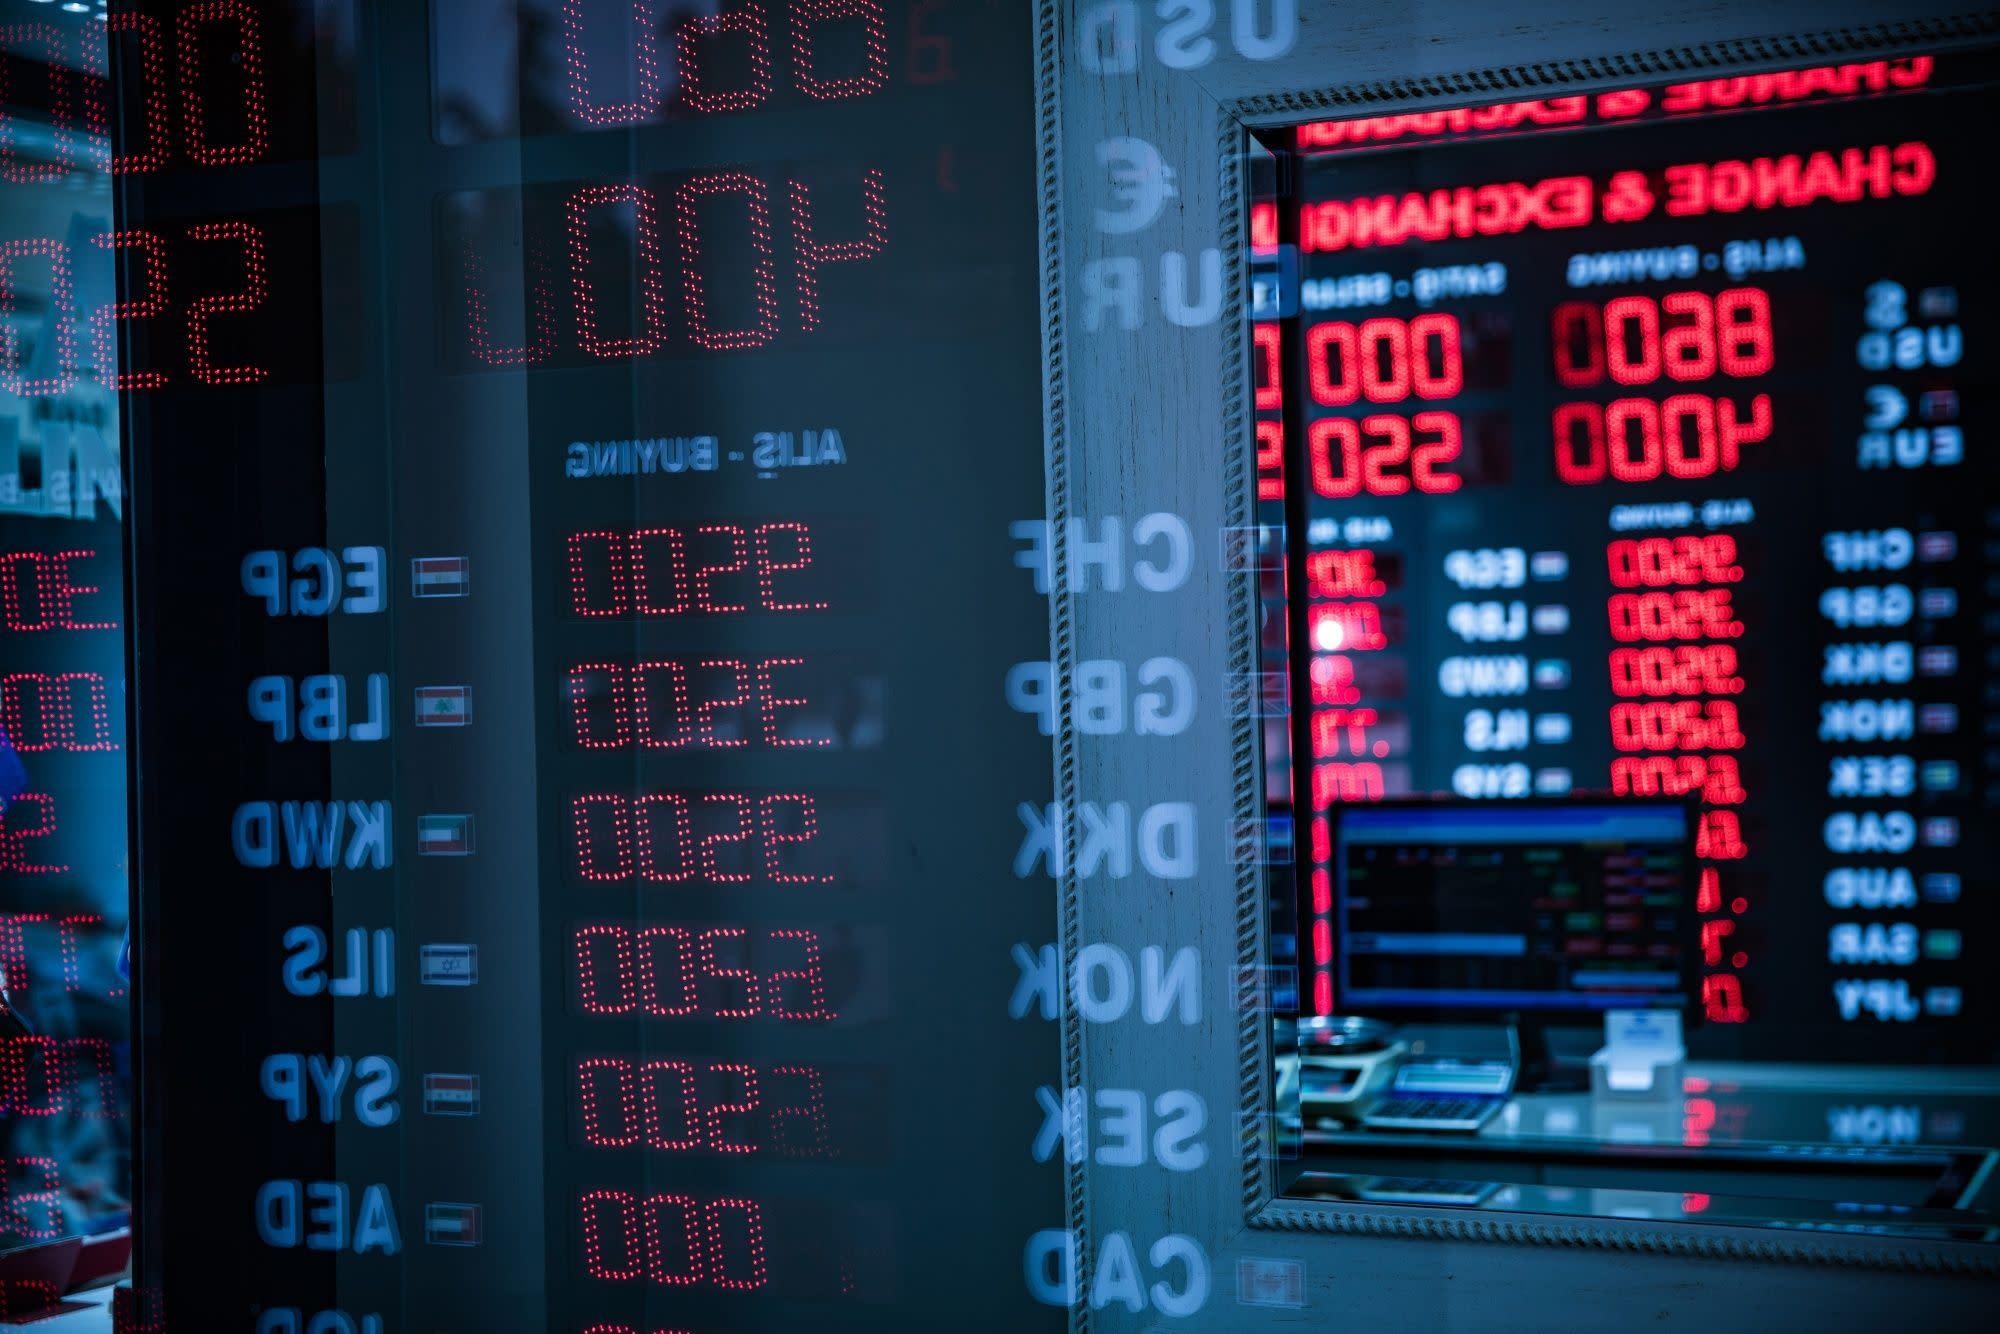 Turkey Lowers Key Banking Ratio to Slow Credit as Lira Falls